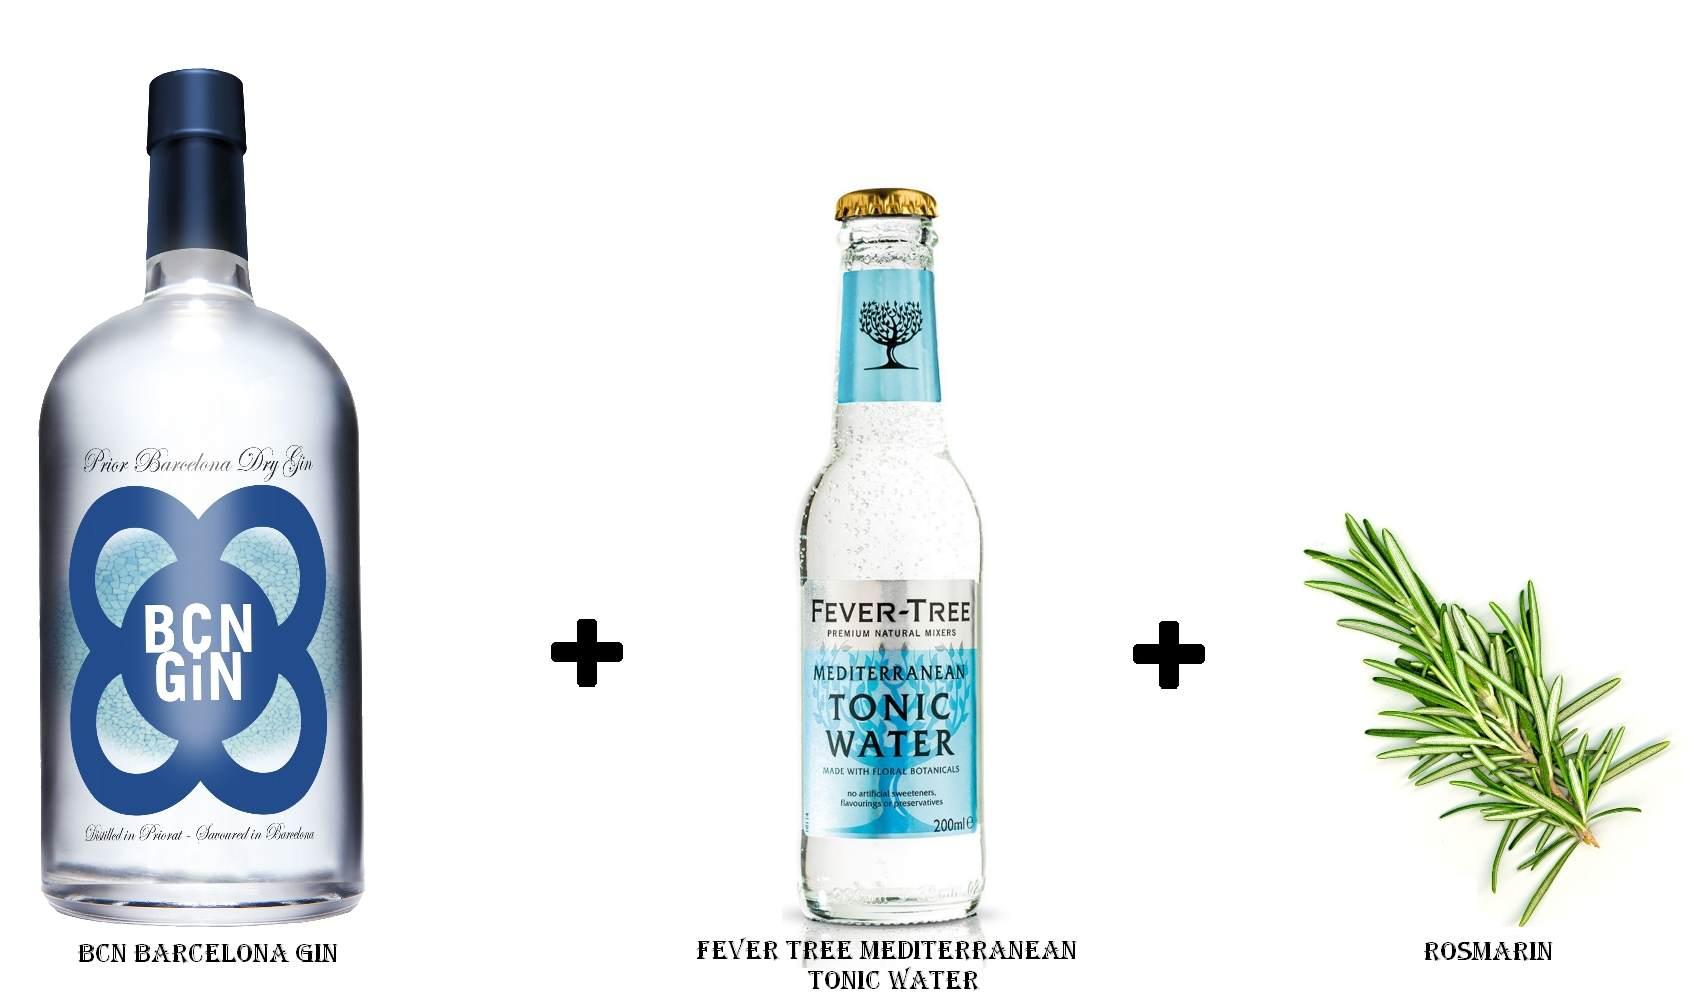 BCN Barcelona Gin + Fever Tree Mediterranean Tonic Water +  Rosmarin